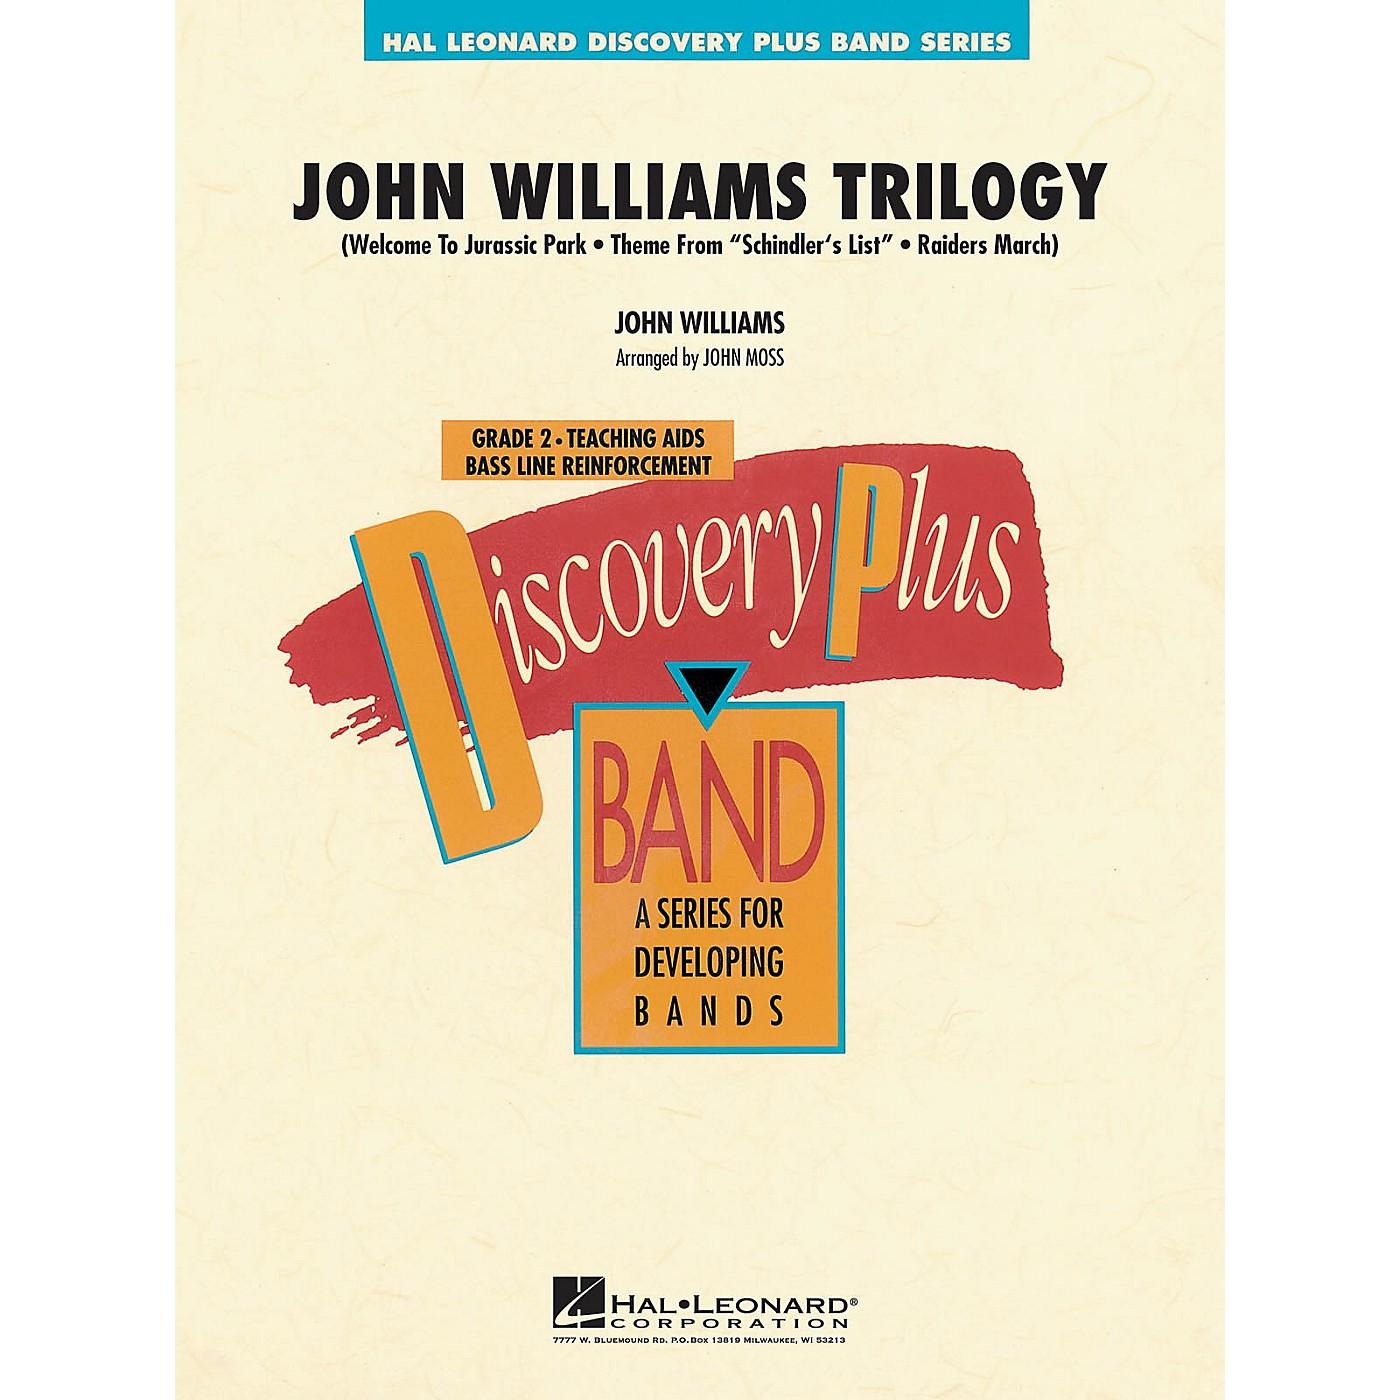 Hal Leonard John Williams Trilogy - Discovery Plus Concert Band Series Level 2 arranged by John Moss thumbnail